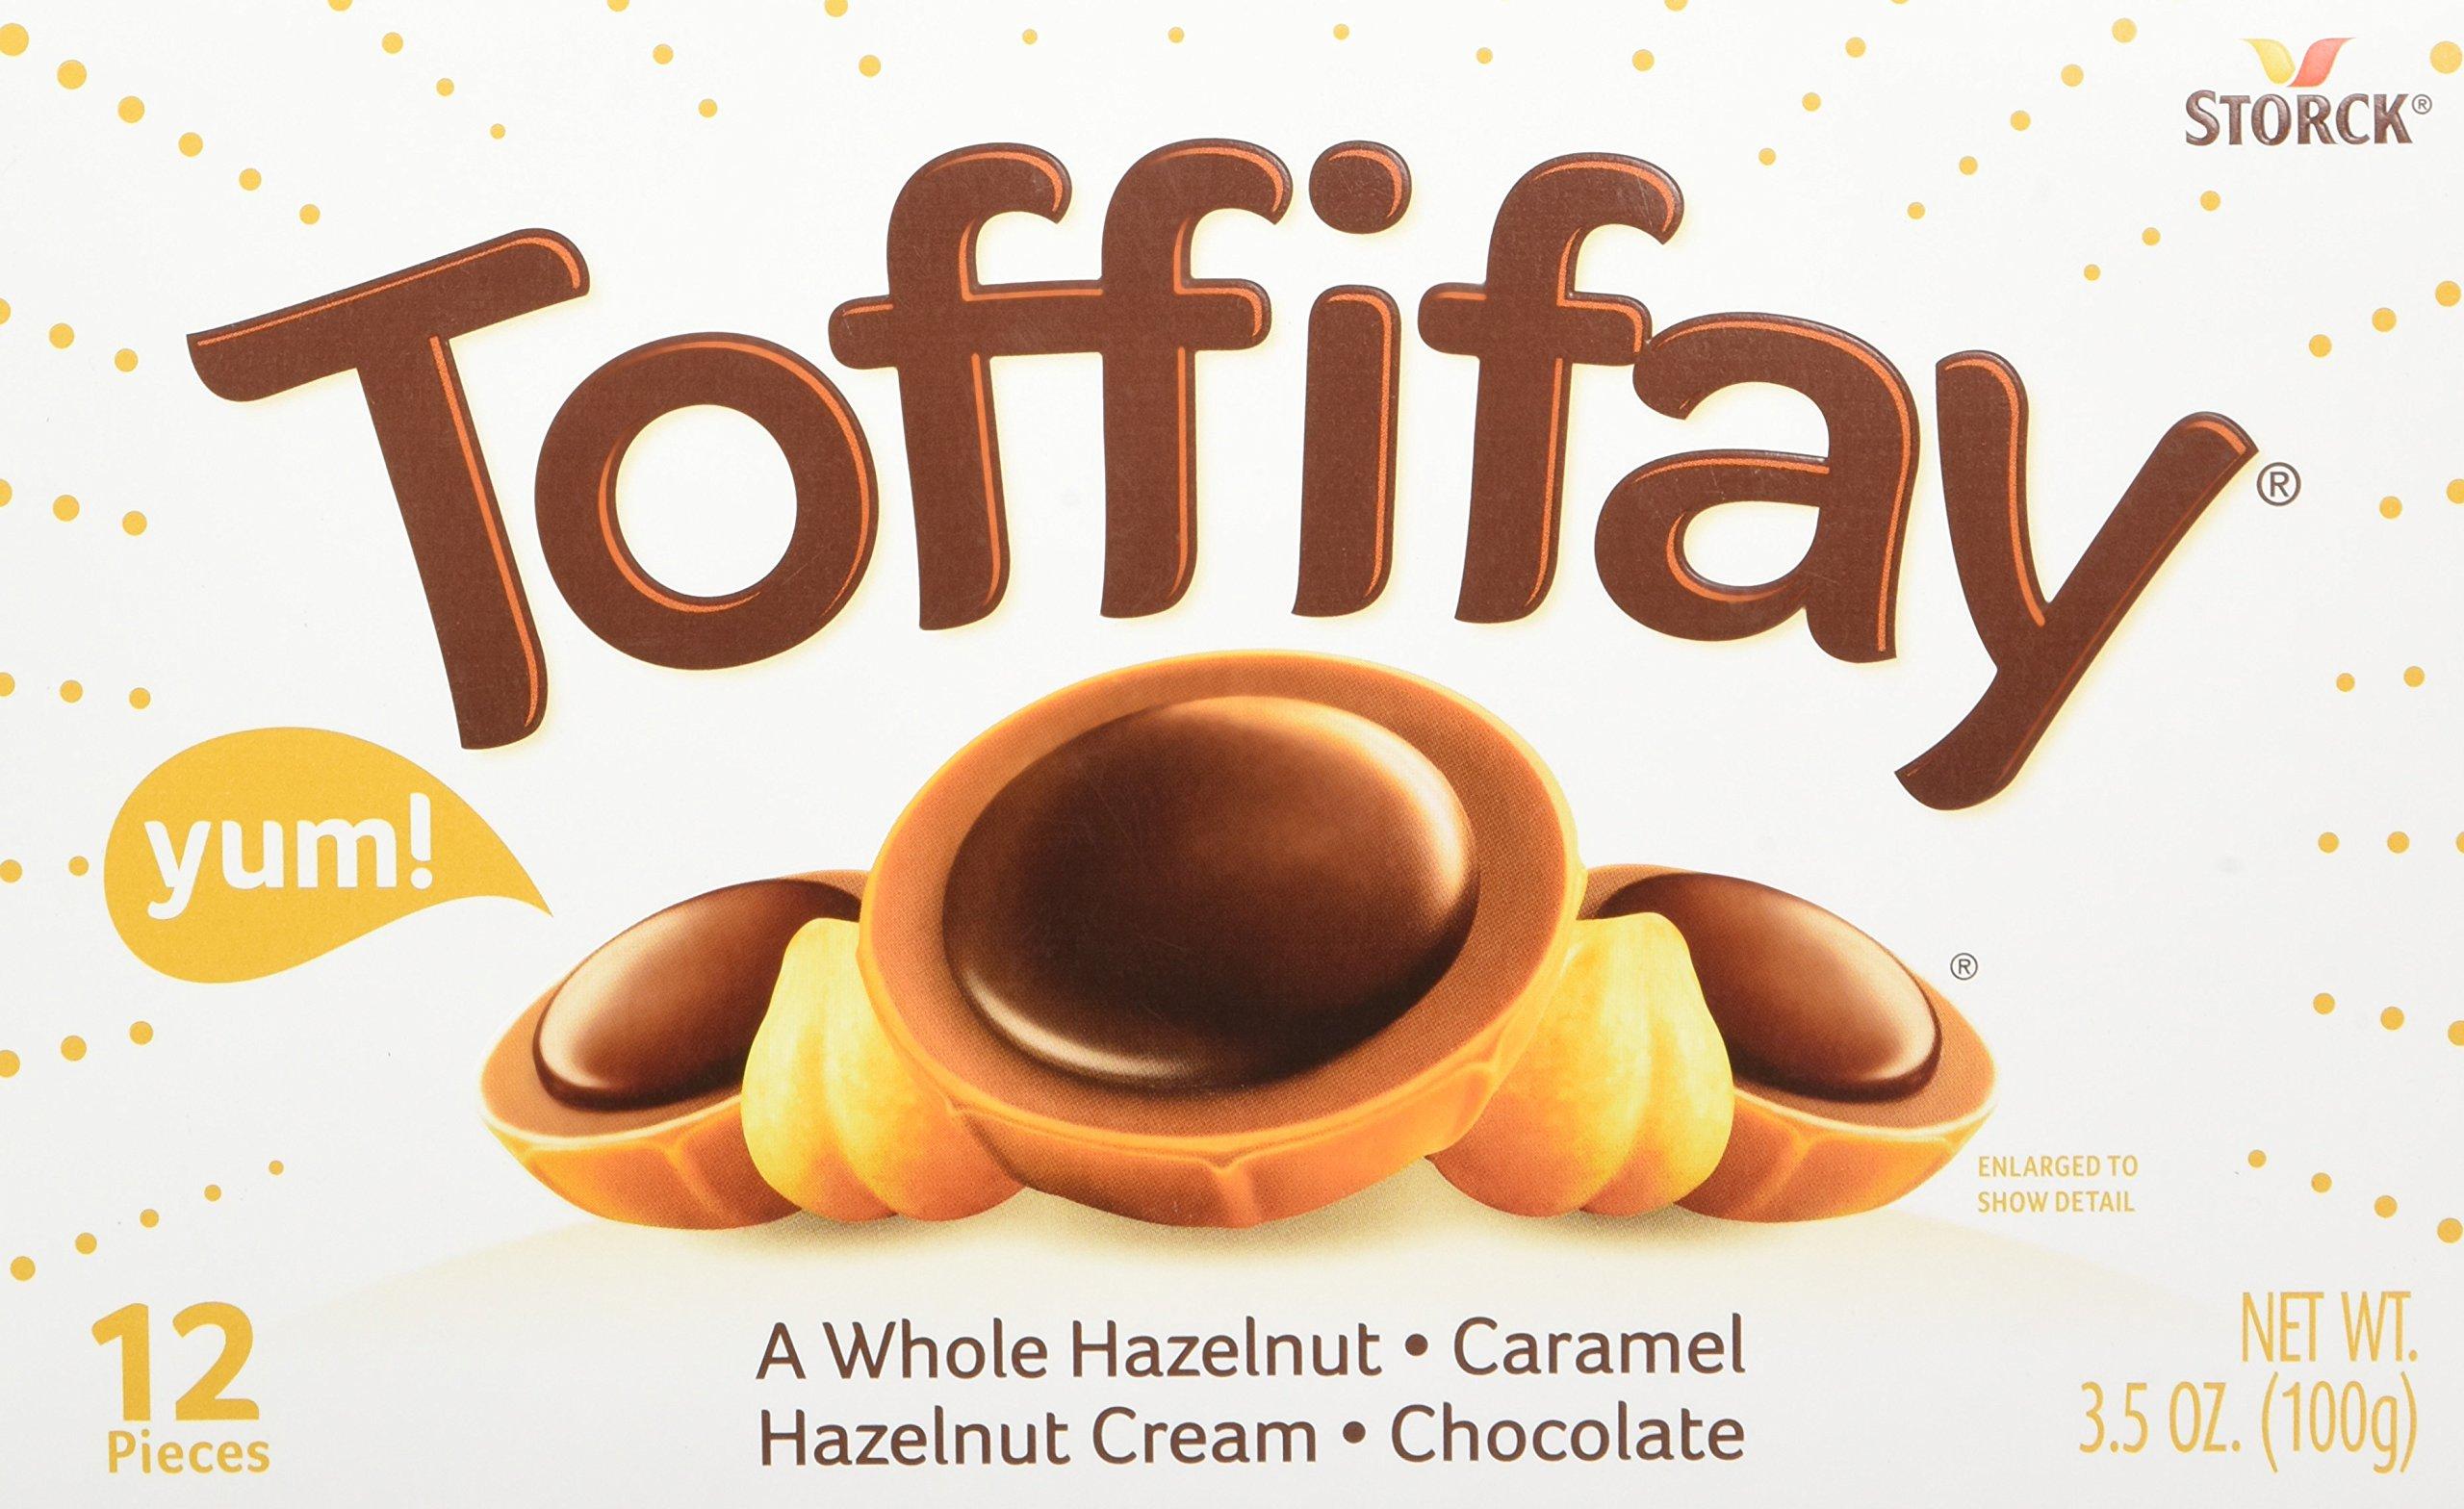 TOFFIFAY Hazelnut Candies, 12 Piece Box